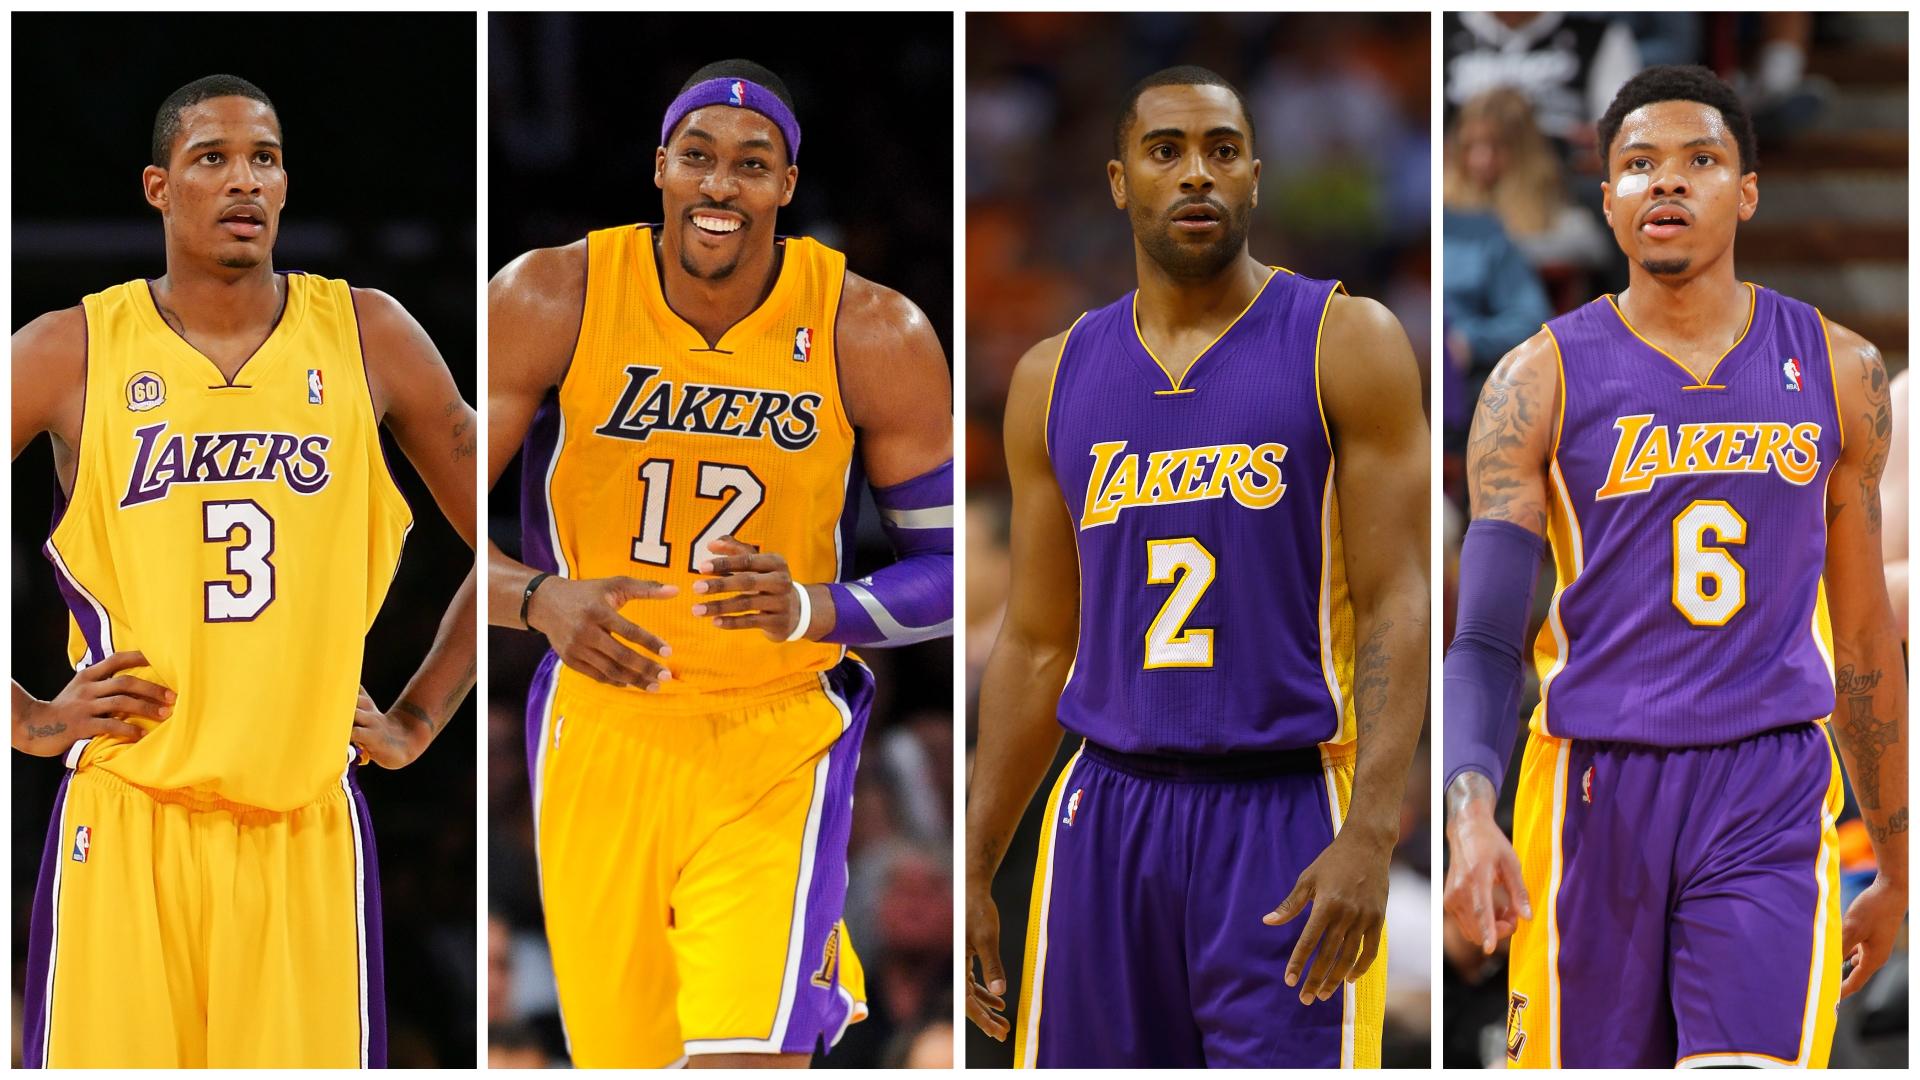 Trevor Ariza, Dwight Howard, Wayne Ellington and Kent Bazemore as Lakers